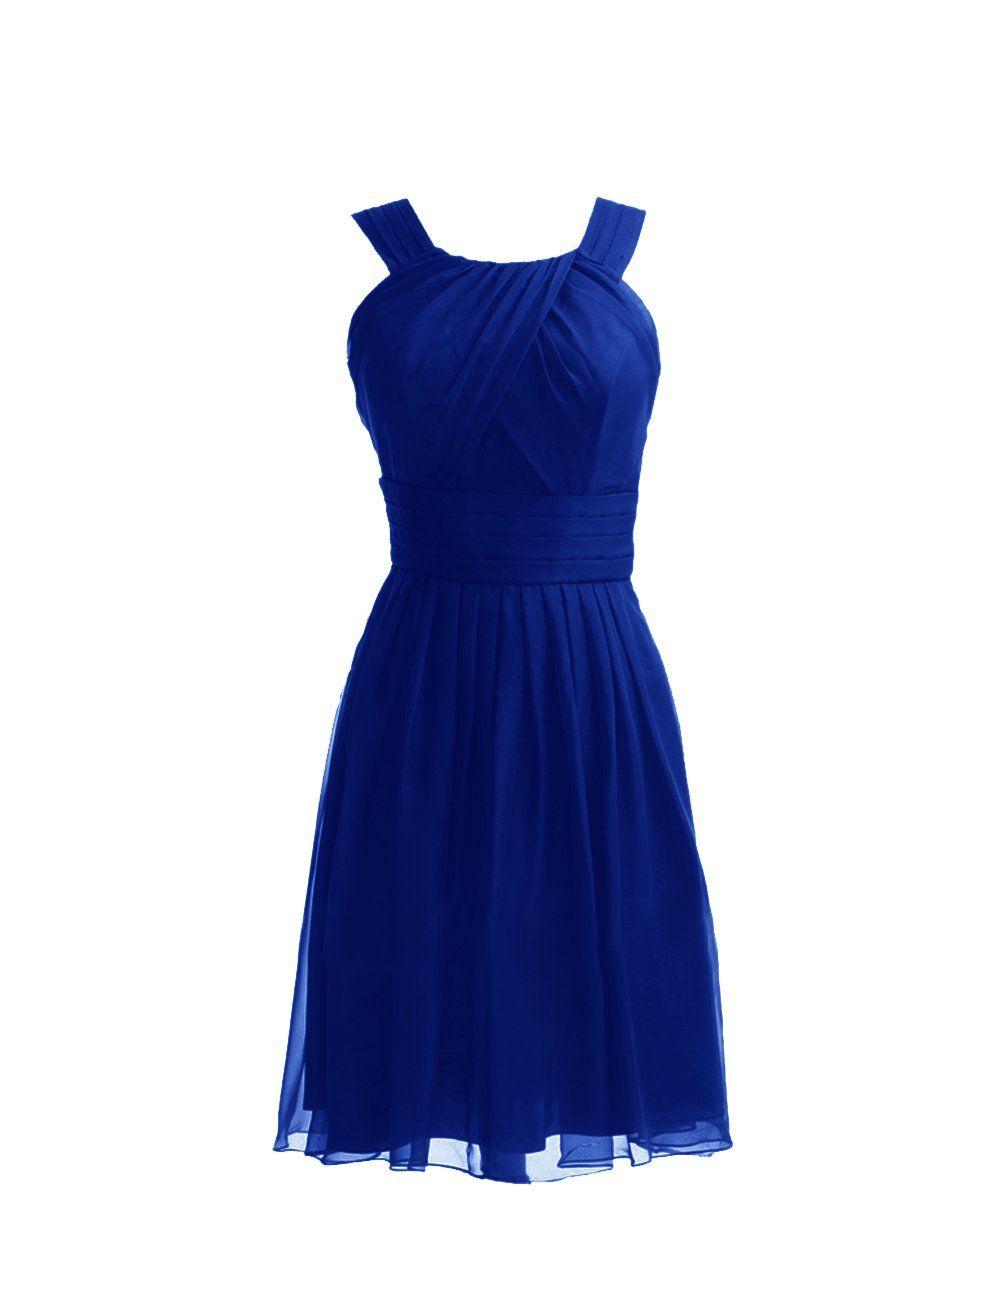 Diyouth Short Bateau Neckline Chiffon Bridesmaid Dresses at Amazon Women's Clothing store: